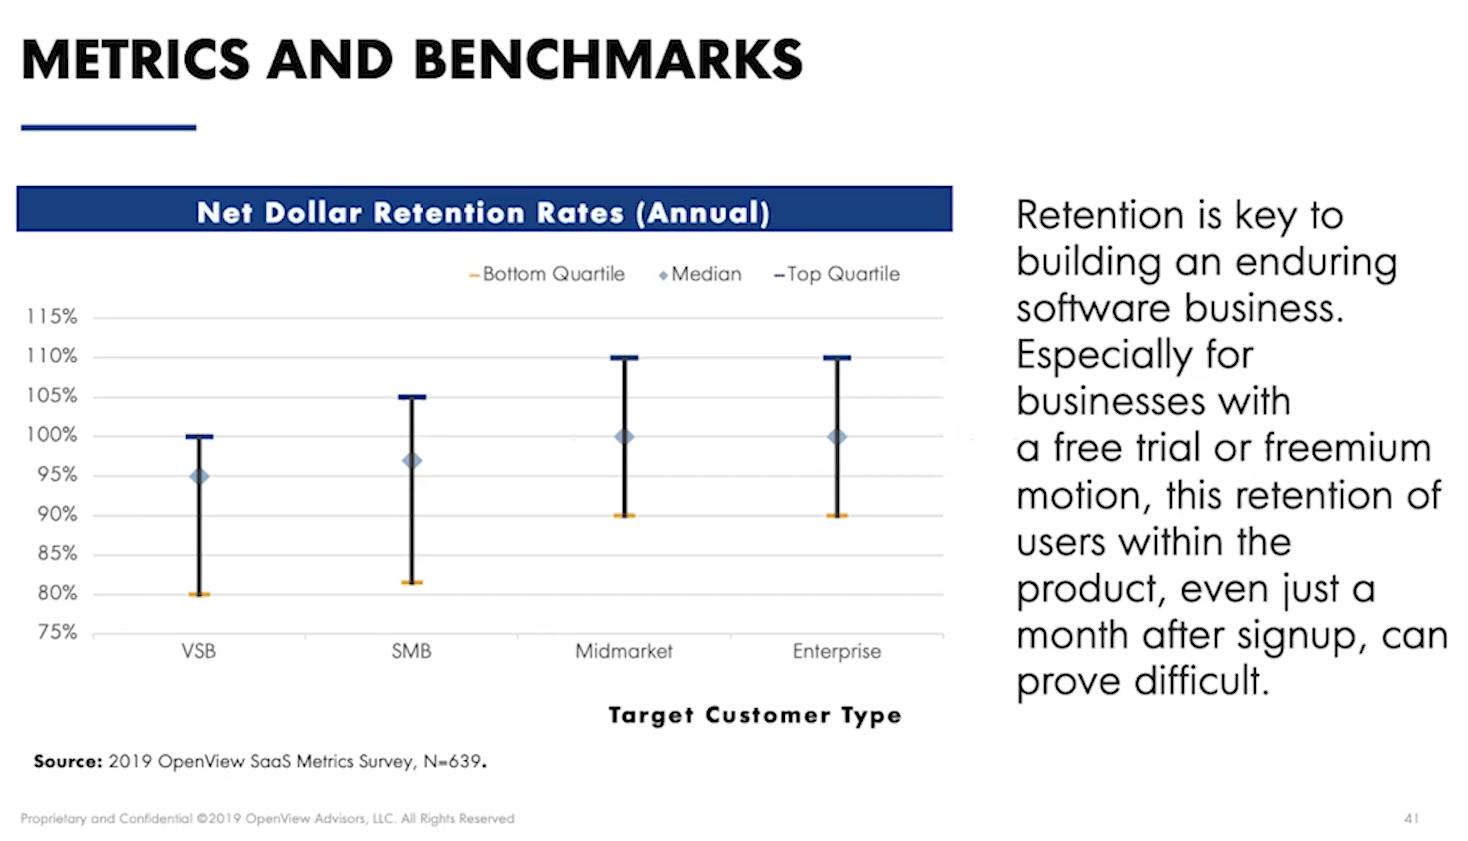 Net Dollar Retention Rates metrics and benchmarks